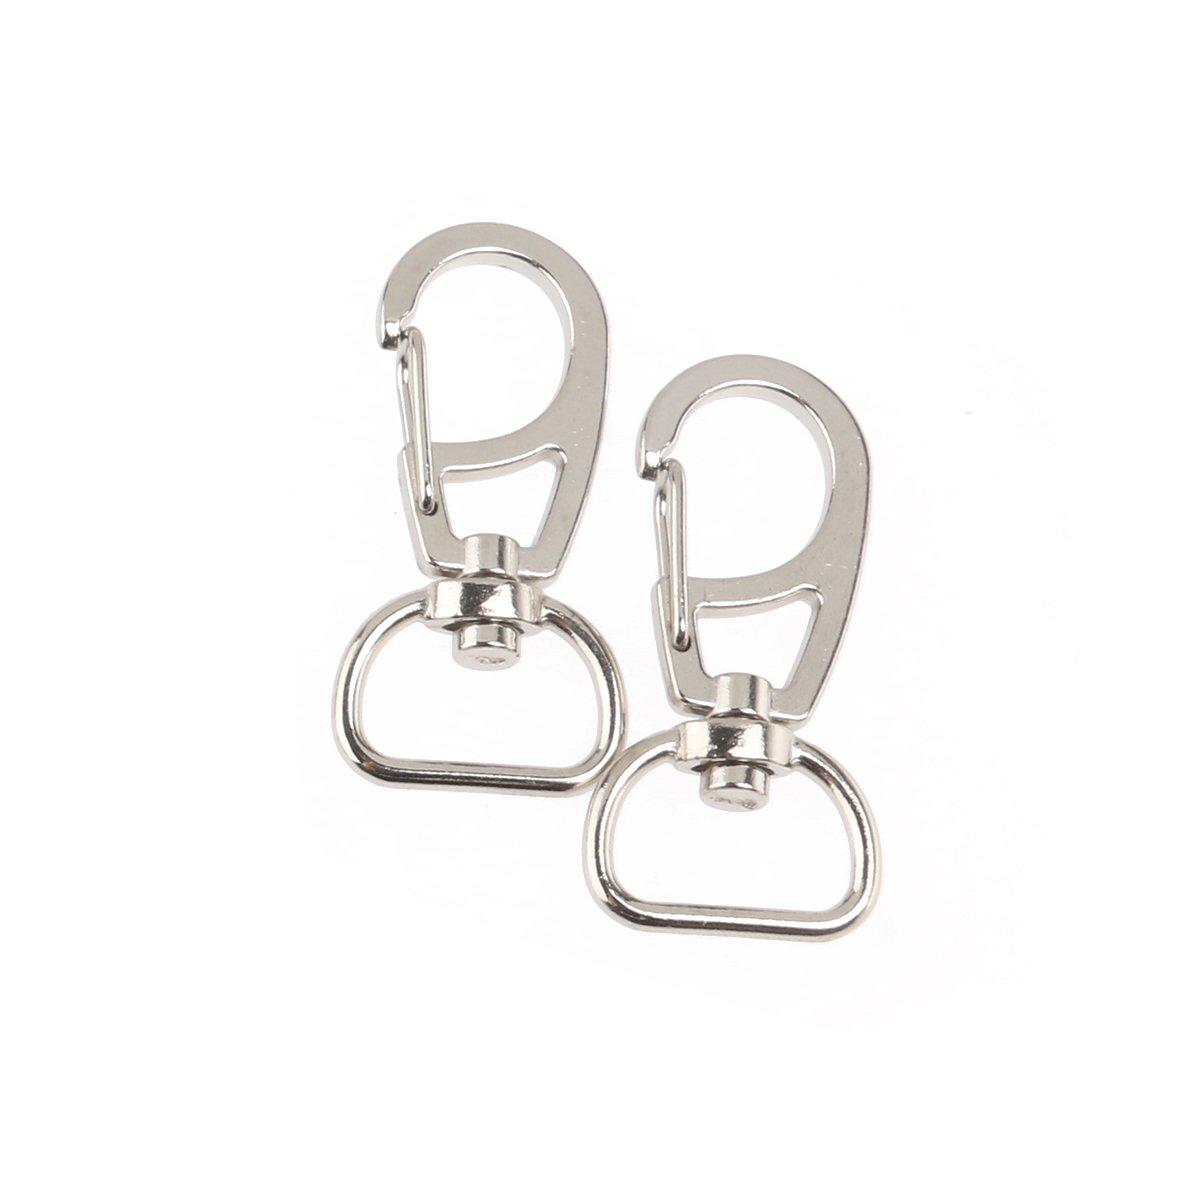 WINOMO 10pcs Metal Swivel Eye Lobster Snap Clasp Hook for Keychain Keyring (Silver)